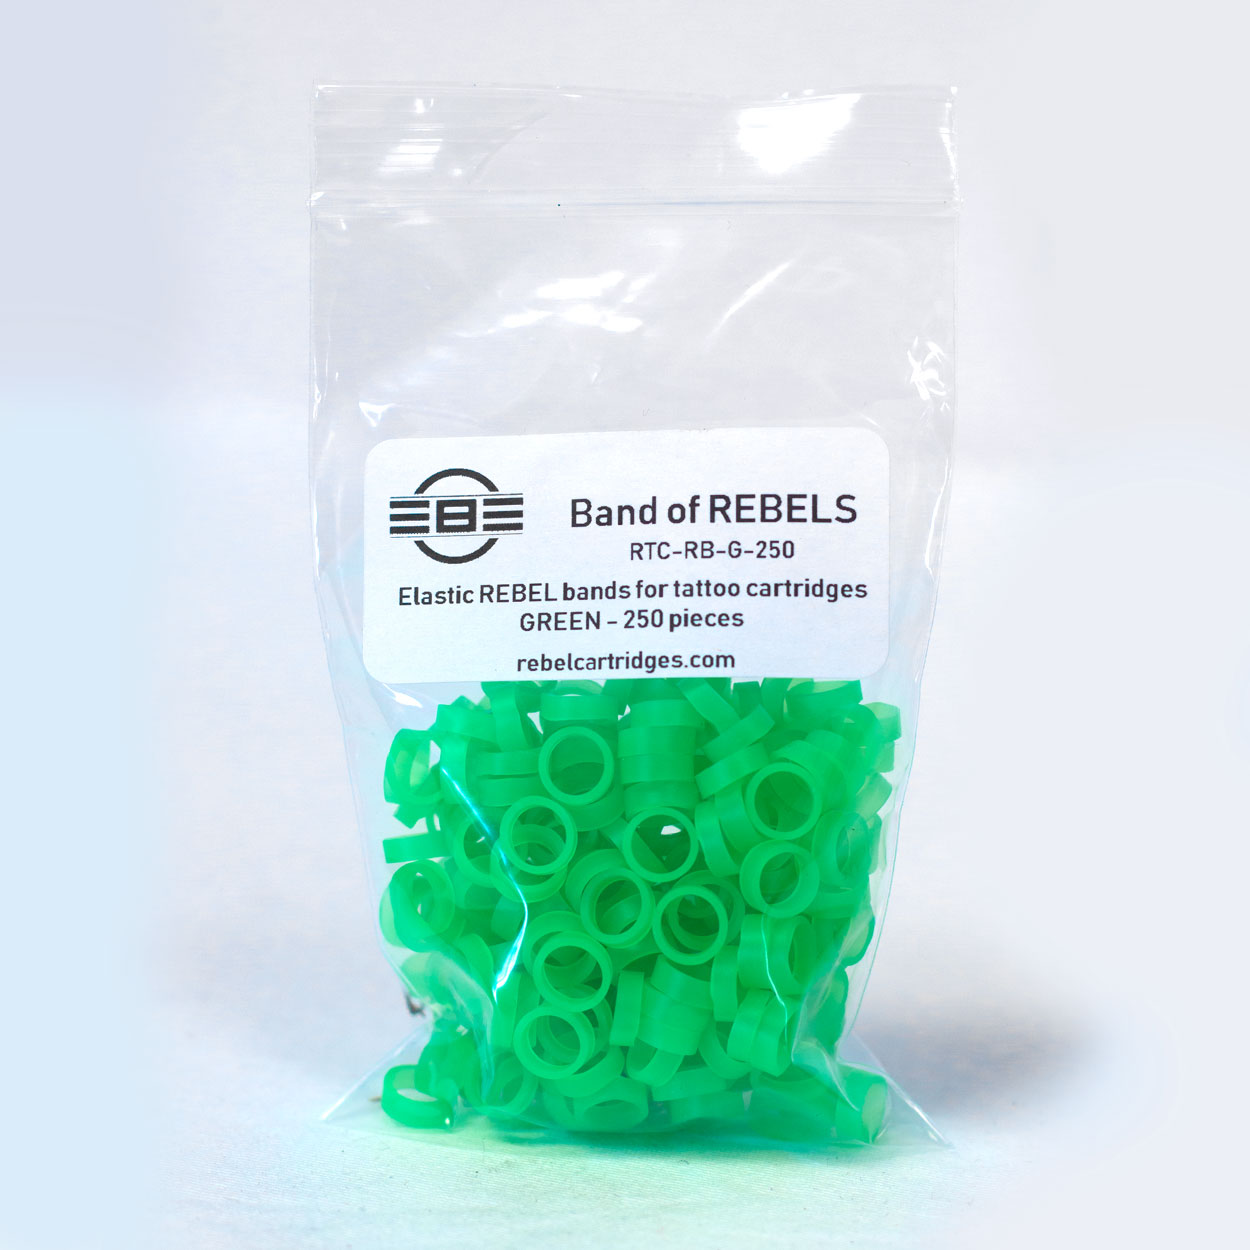 Band of REBELS - 250pc package - REBEL Tattoo Equipment